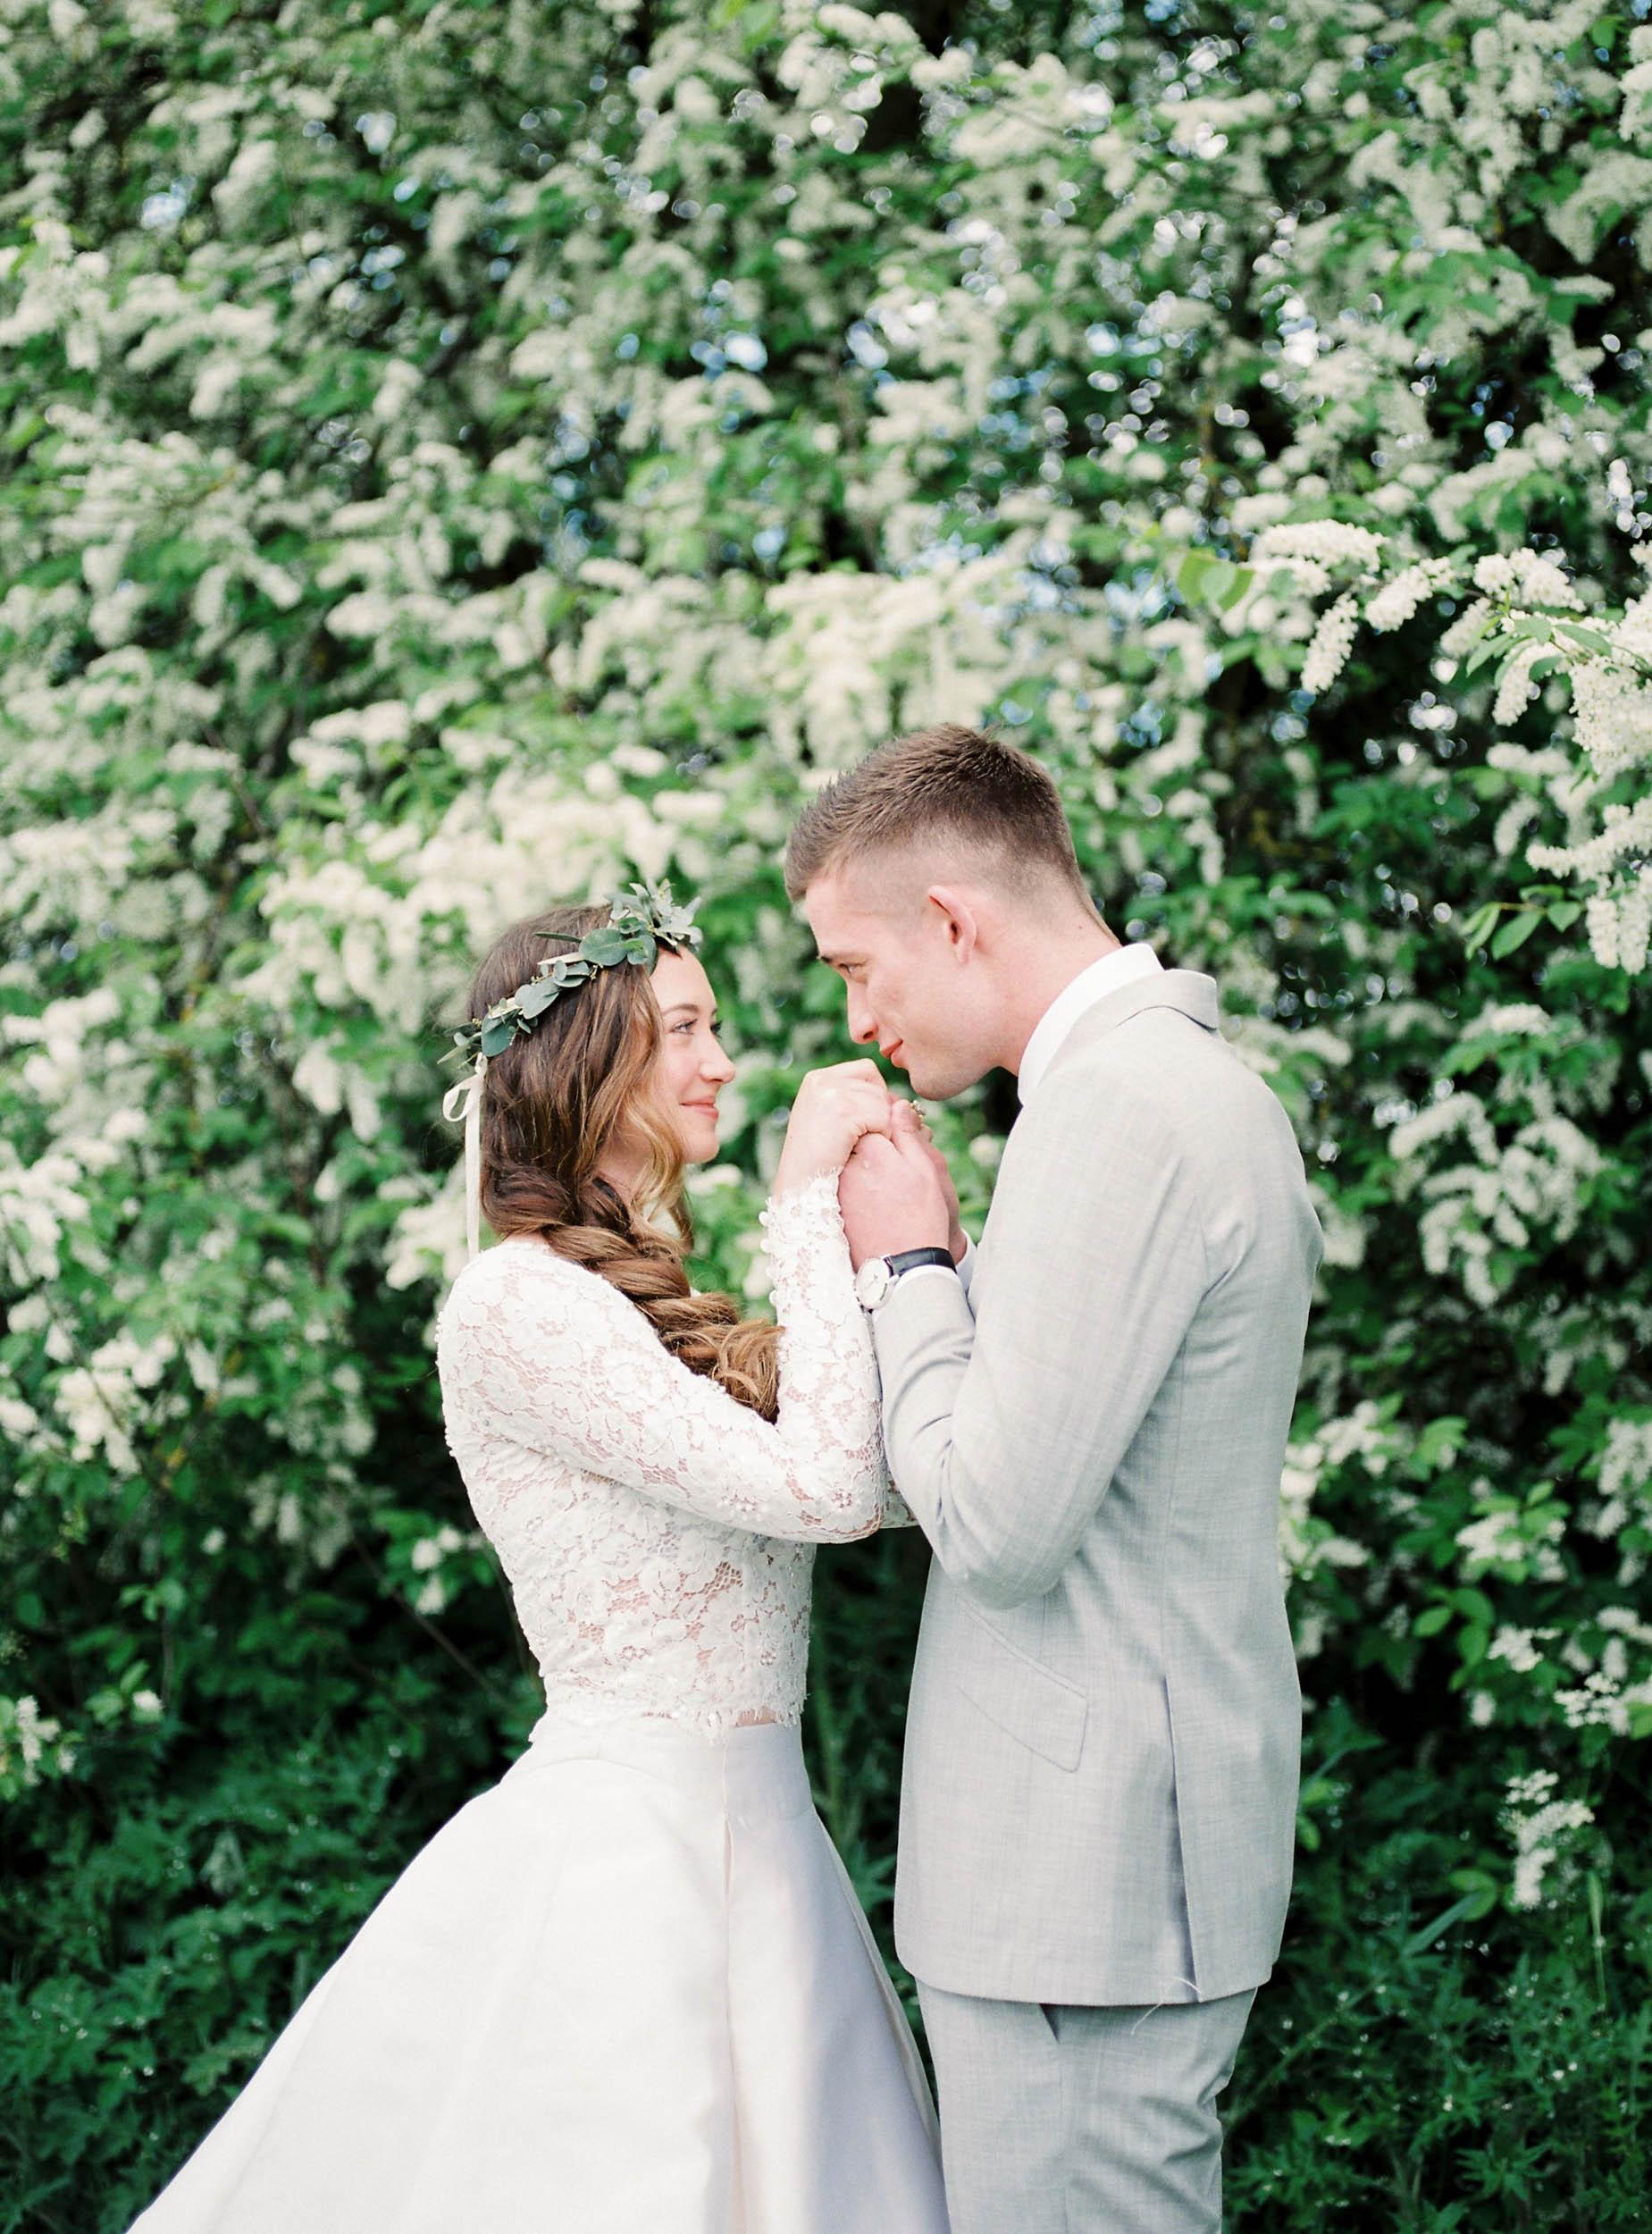 Amy O'Boyle Photography- Destination & UK Fine Art Film Wedding Photographer- Stubton Hall Wedding Shoot-29.jpg